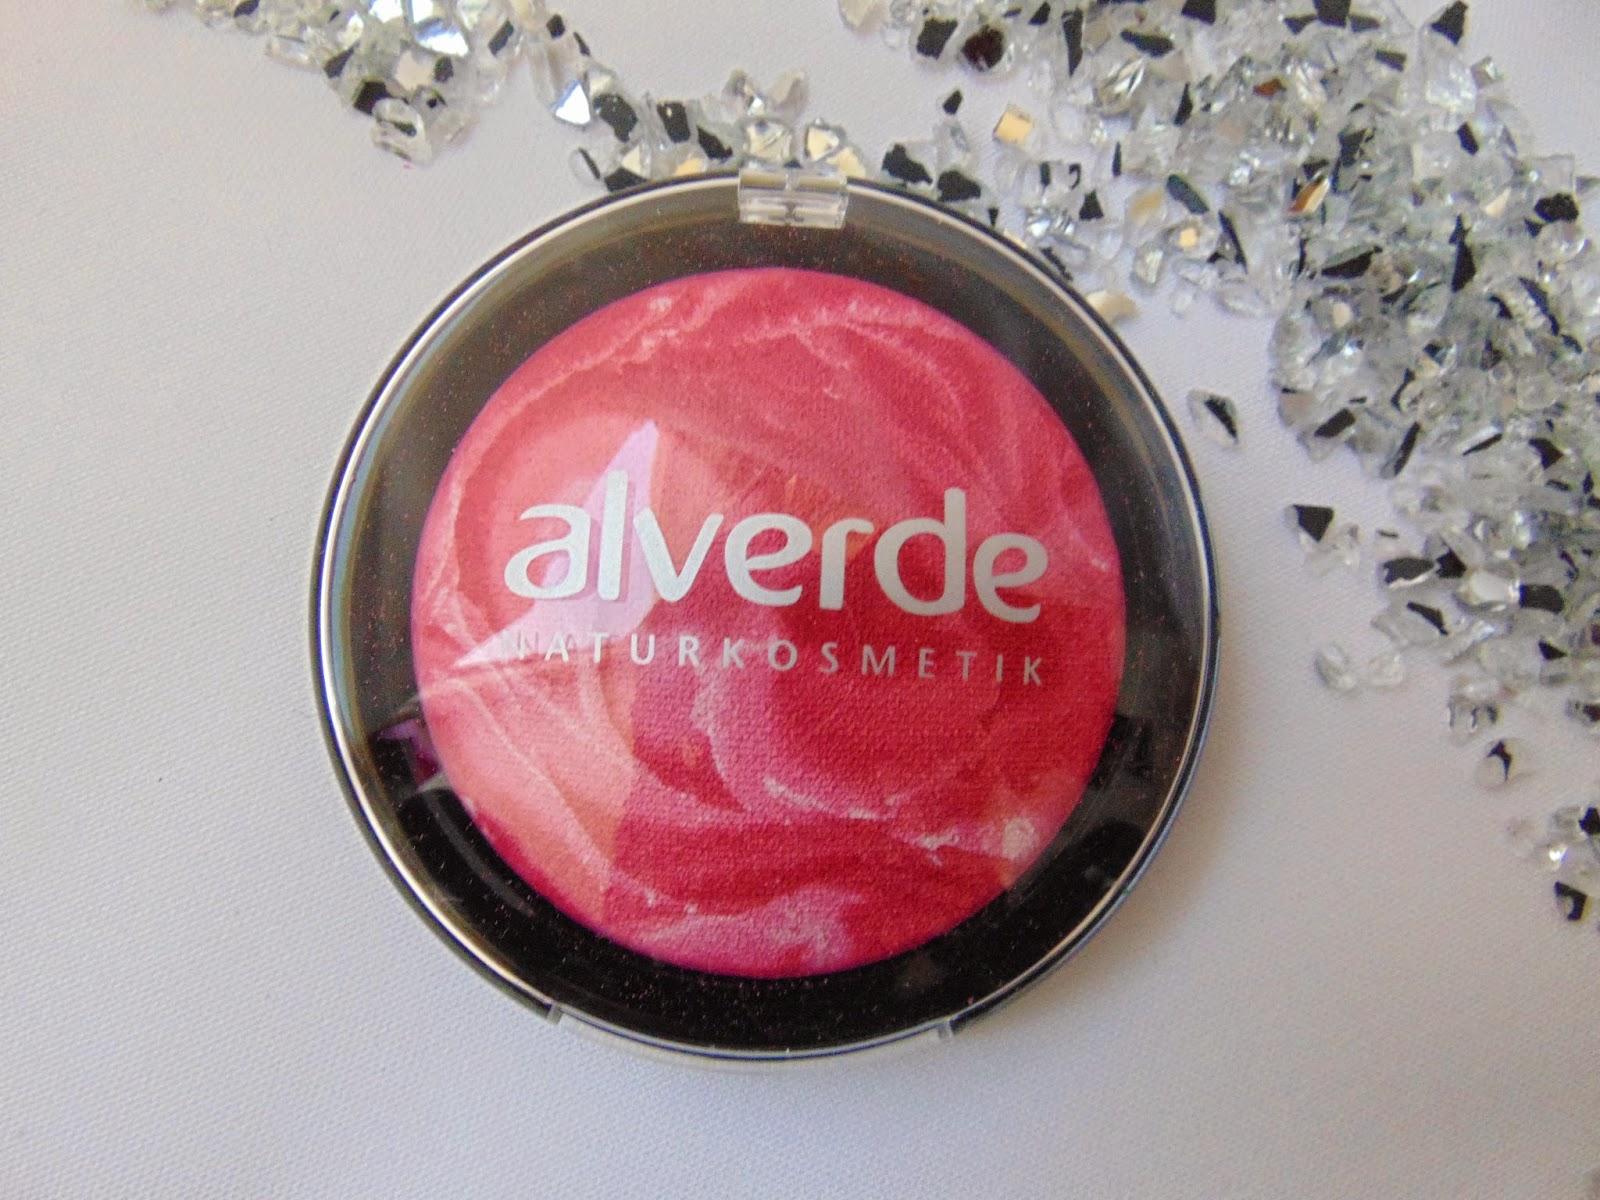 Alverde LE - Faboulus Fifties - Gebackenes Rouge – Lolli Pink 20 - www.annitschkasblog.de